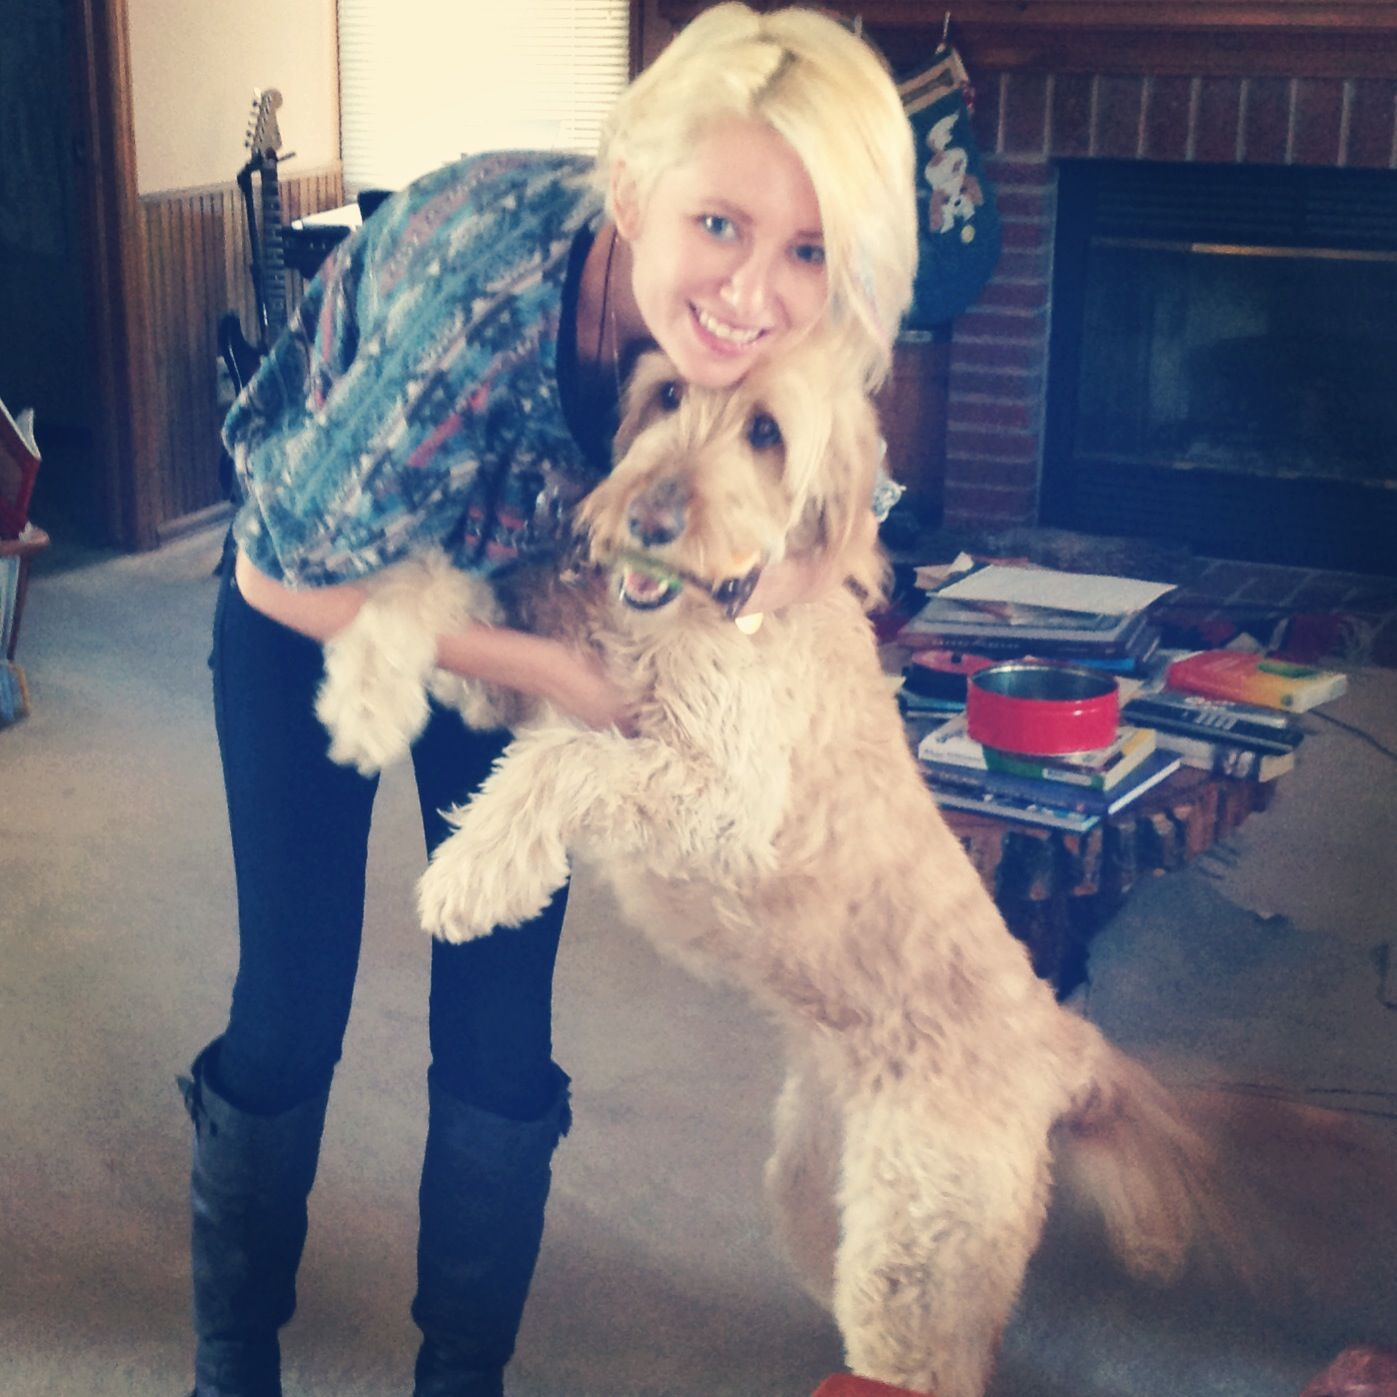 Me and my dog. #goldendoodle #love #mydog